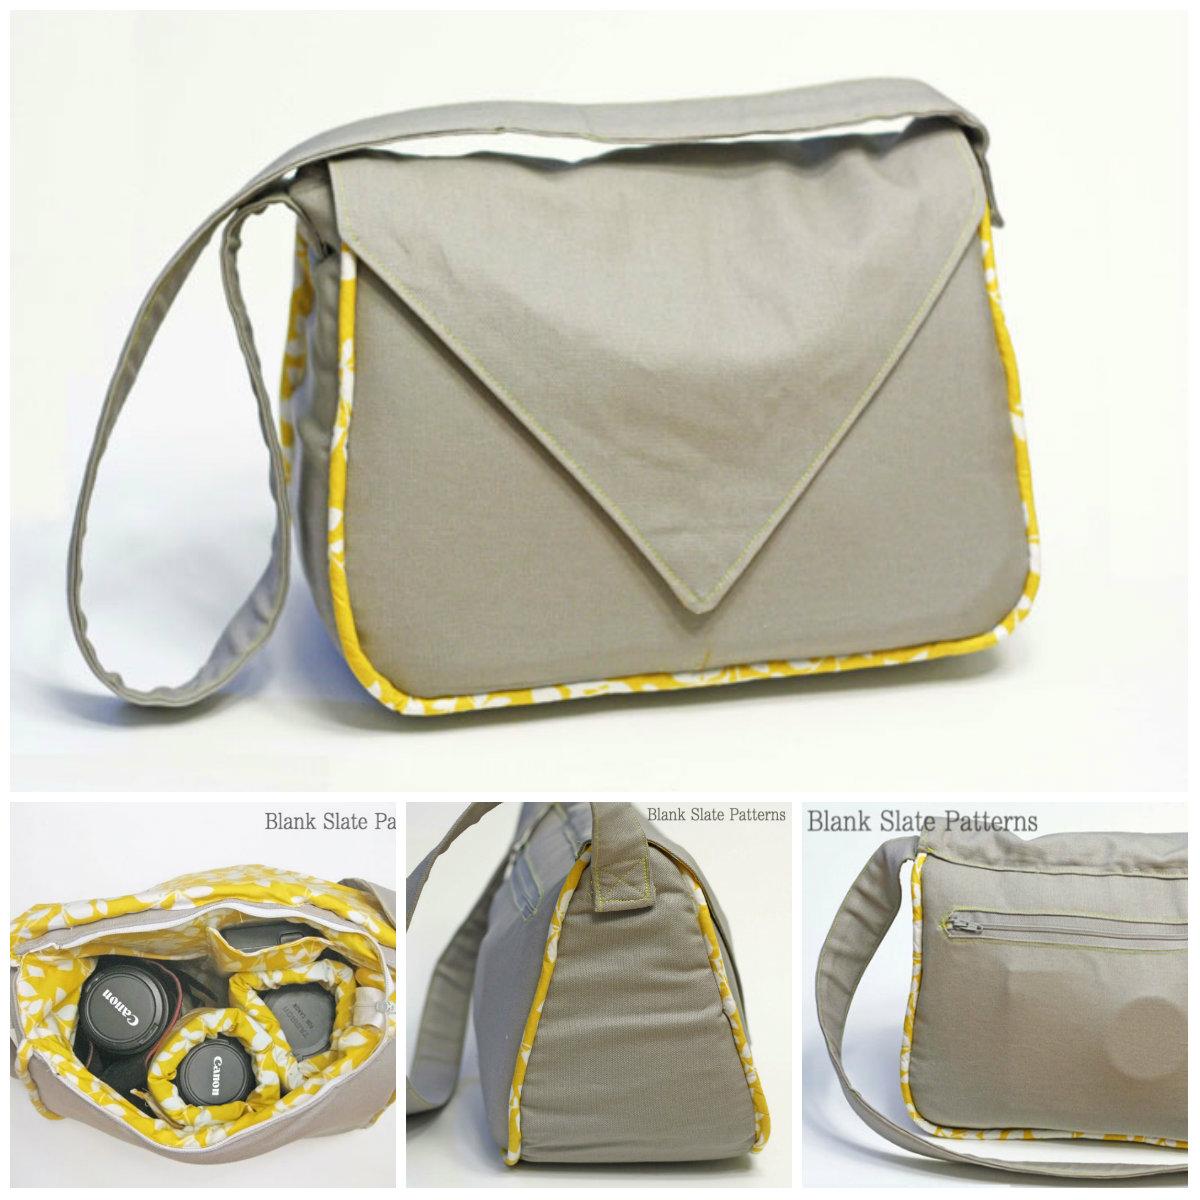 Blank Slate Bag Padded Camera Bag